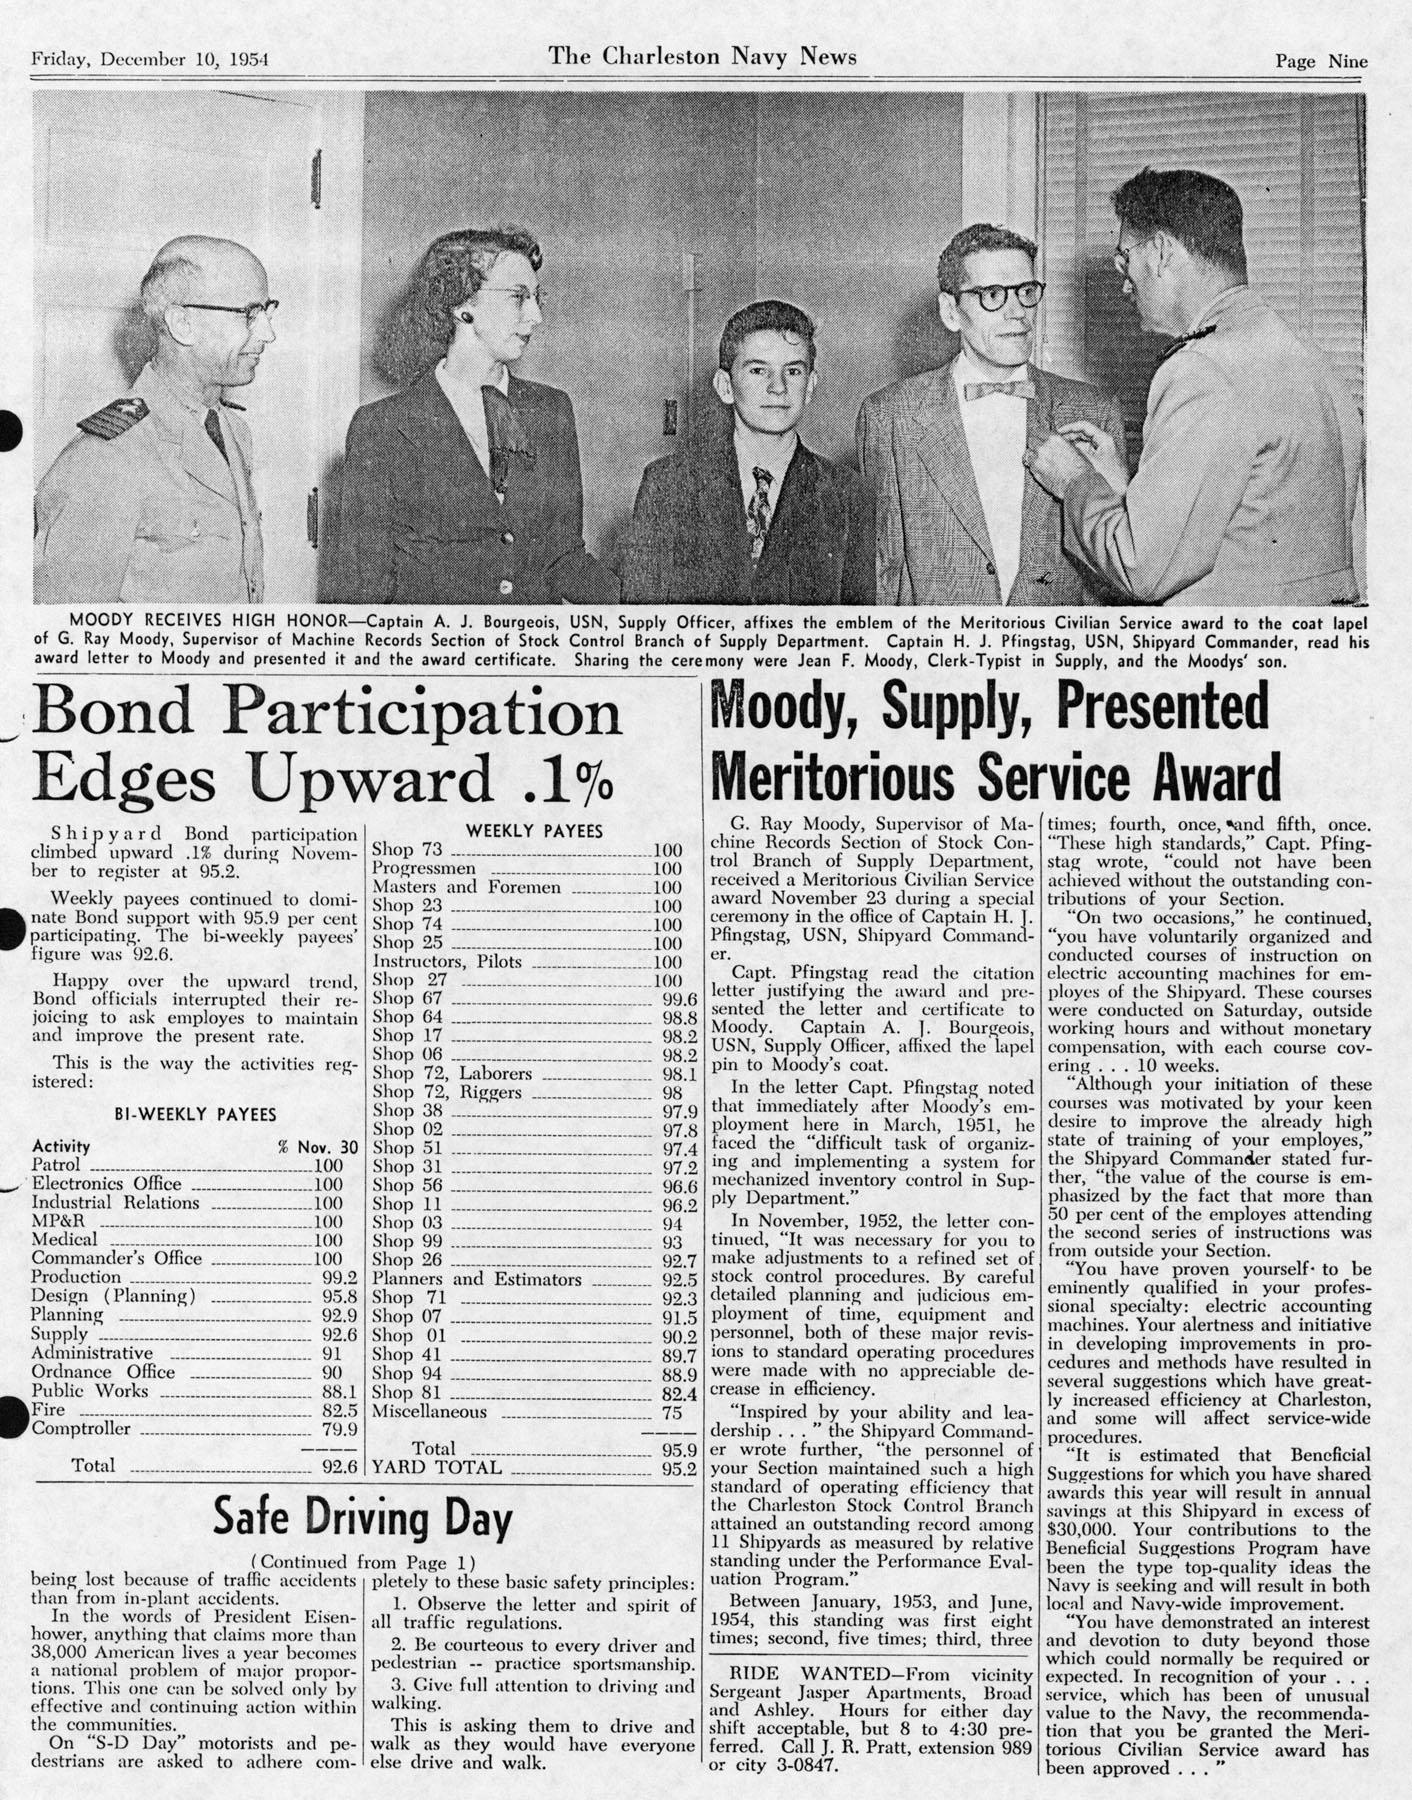 The Charleston Navy News, Volume 13, Edition 11, page ix